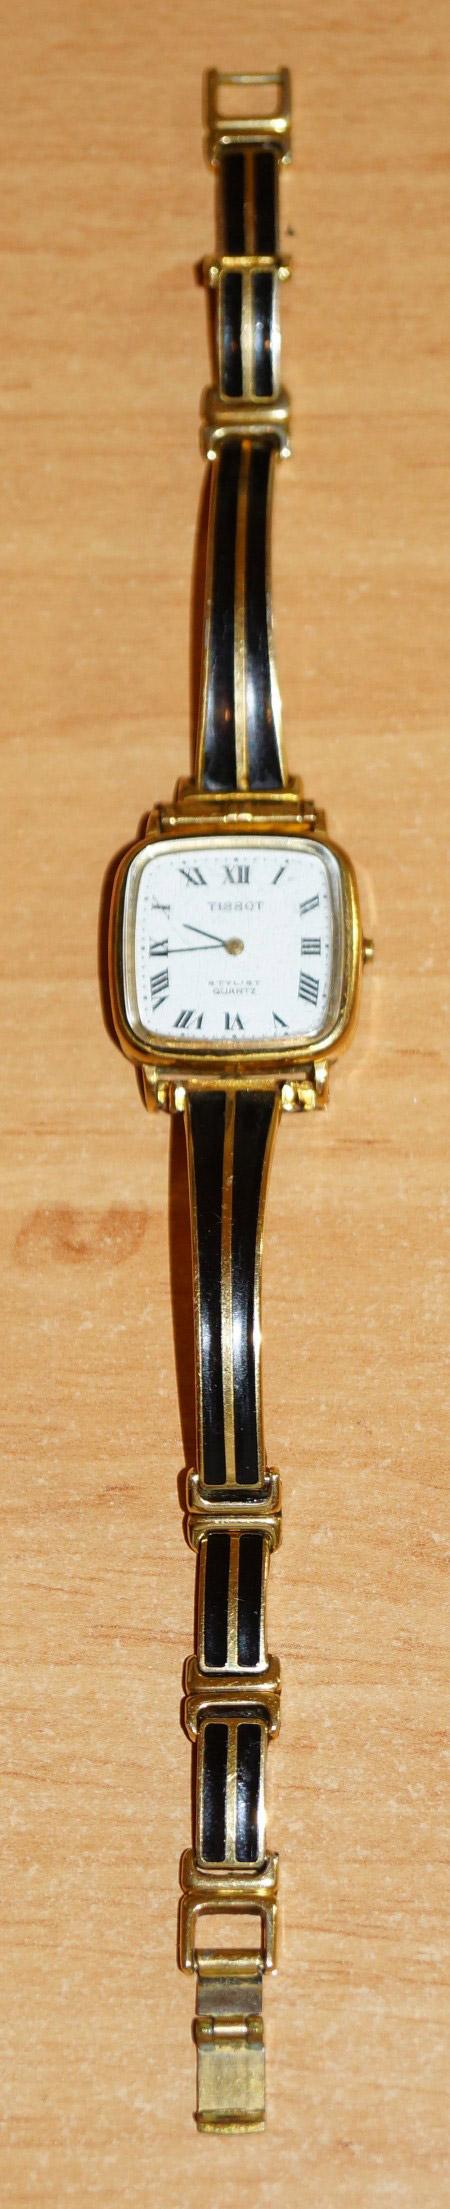 Tissot - Stylist - Damen - Armbanduhr - 1000.jpg